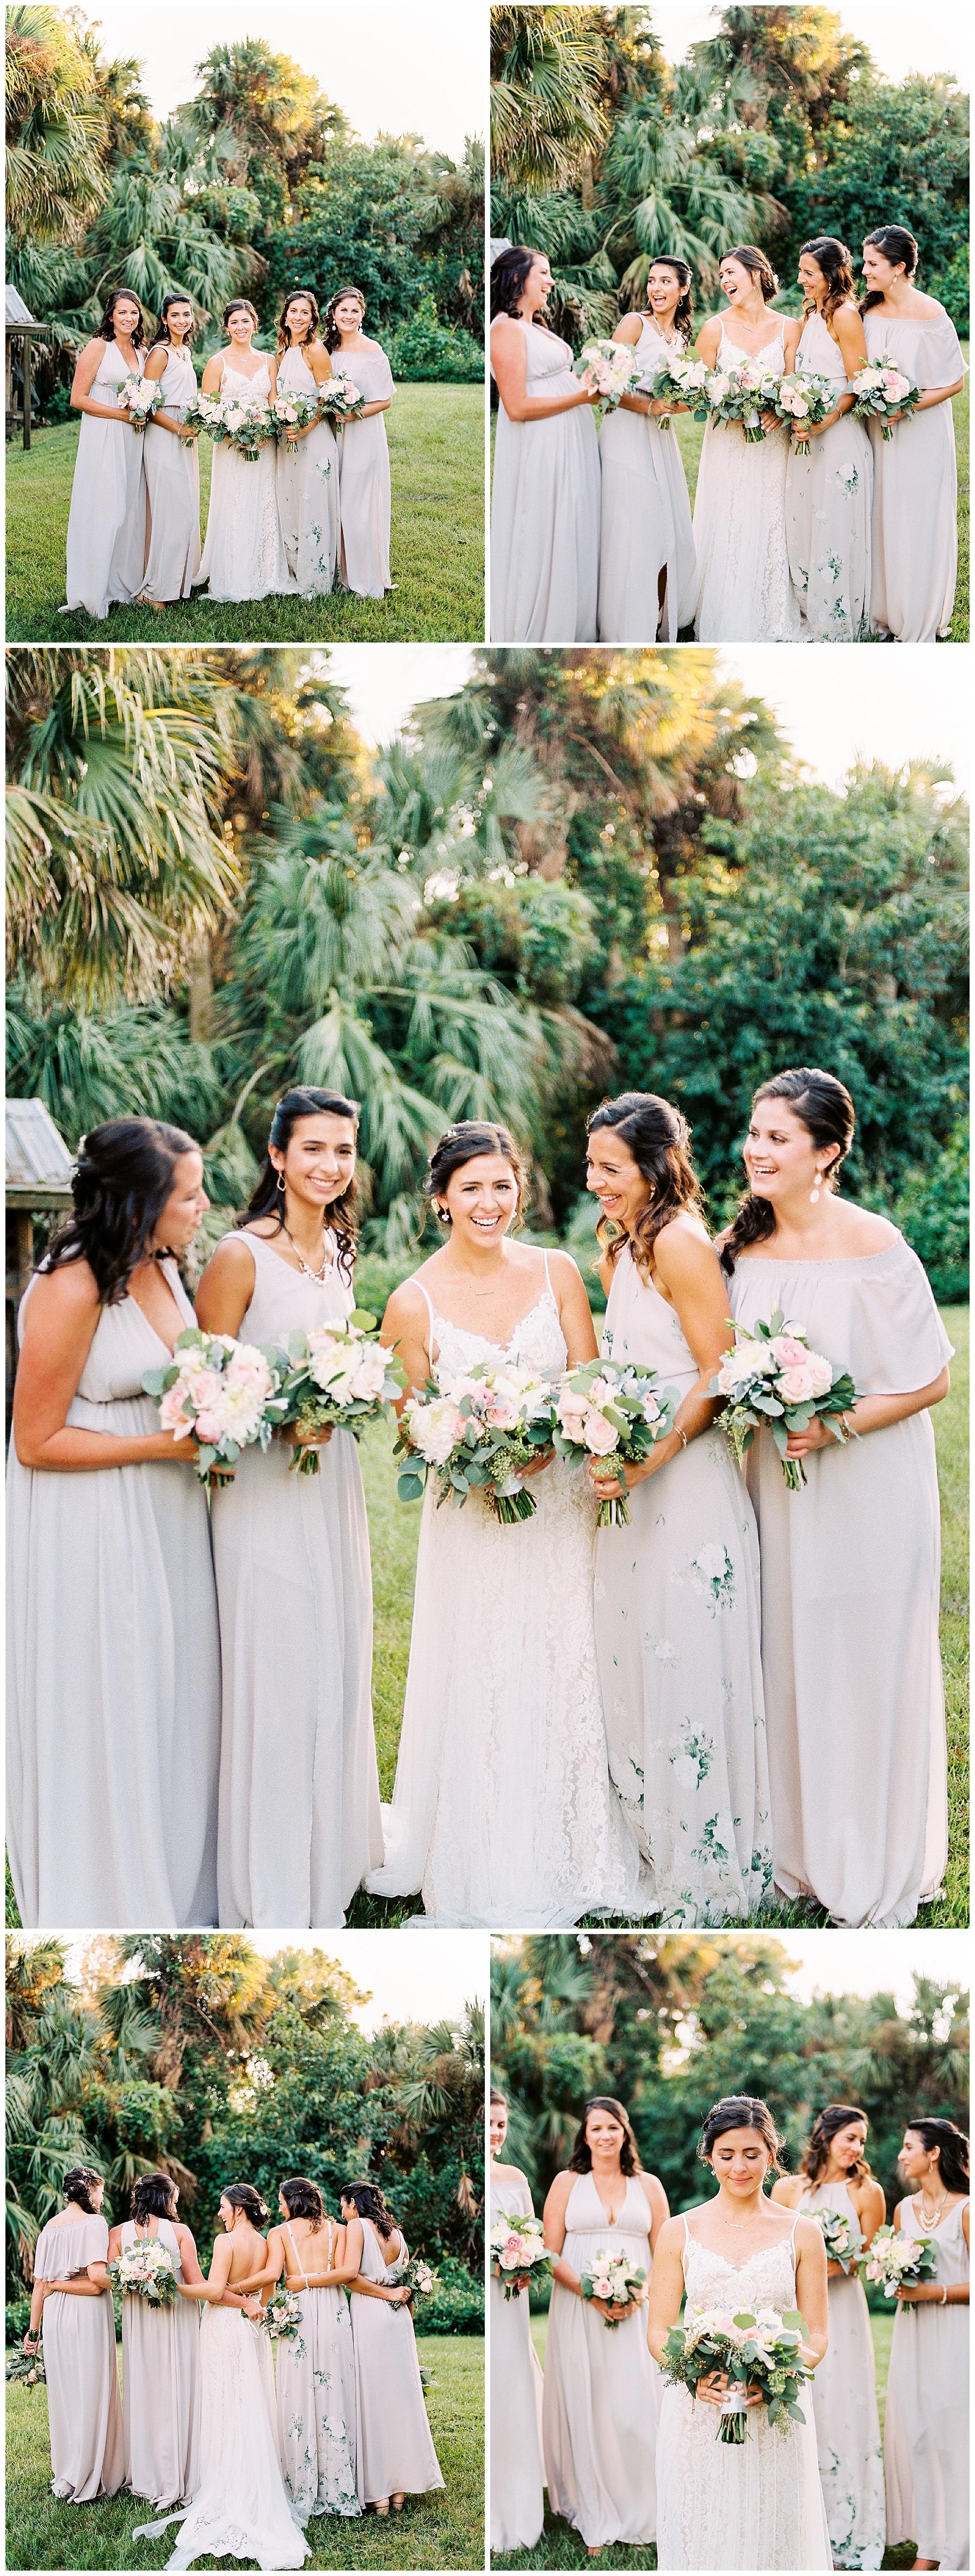 banyan estate malabar palm bay fl bridal party bridesmaids wedding photos